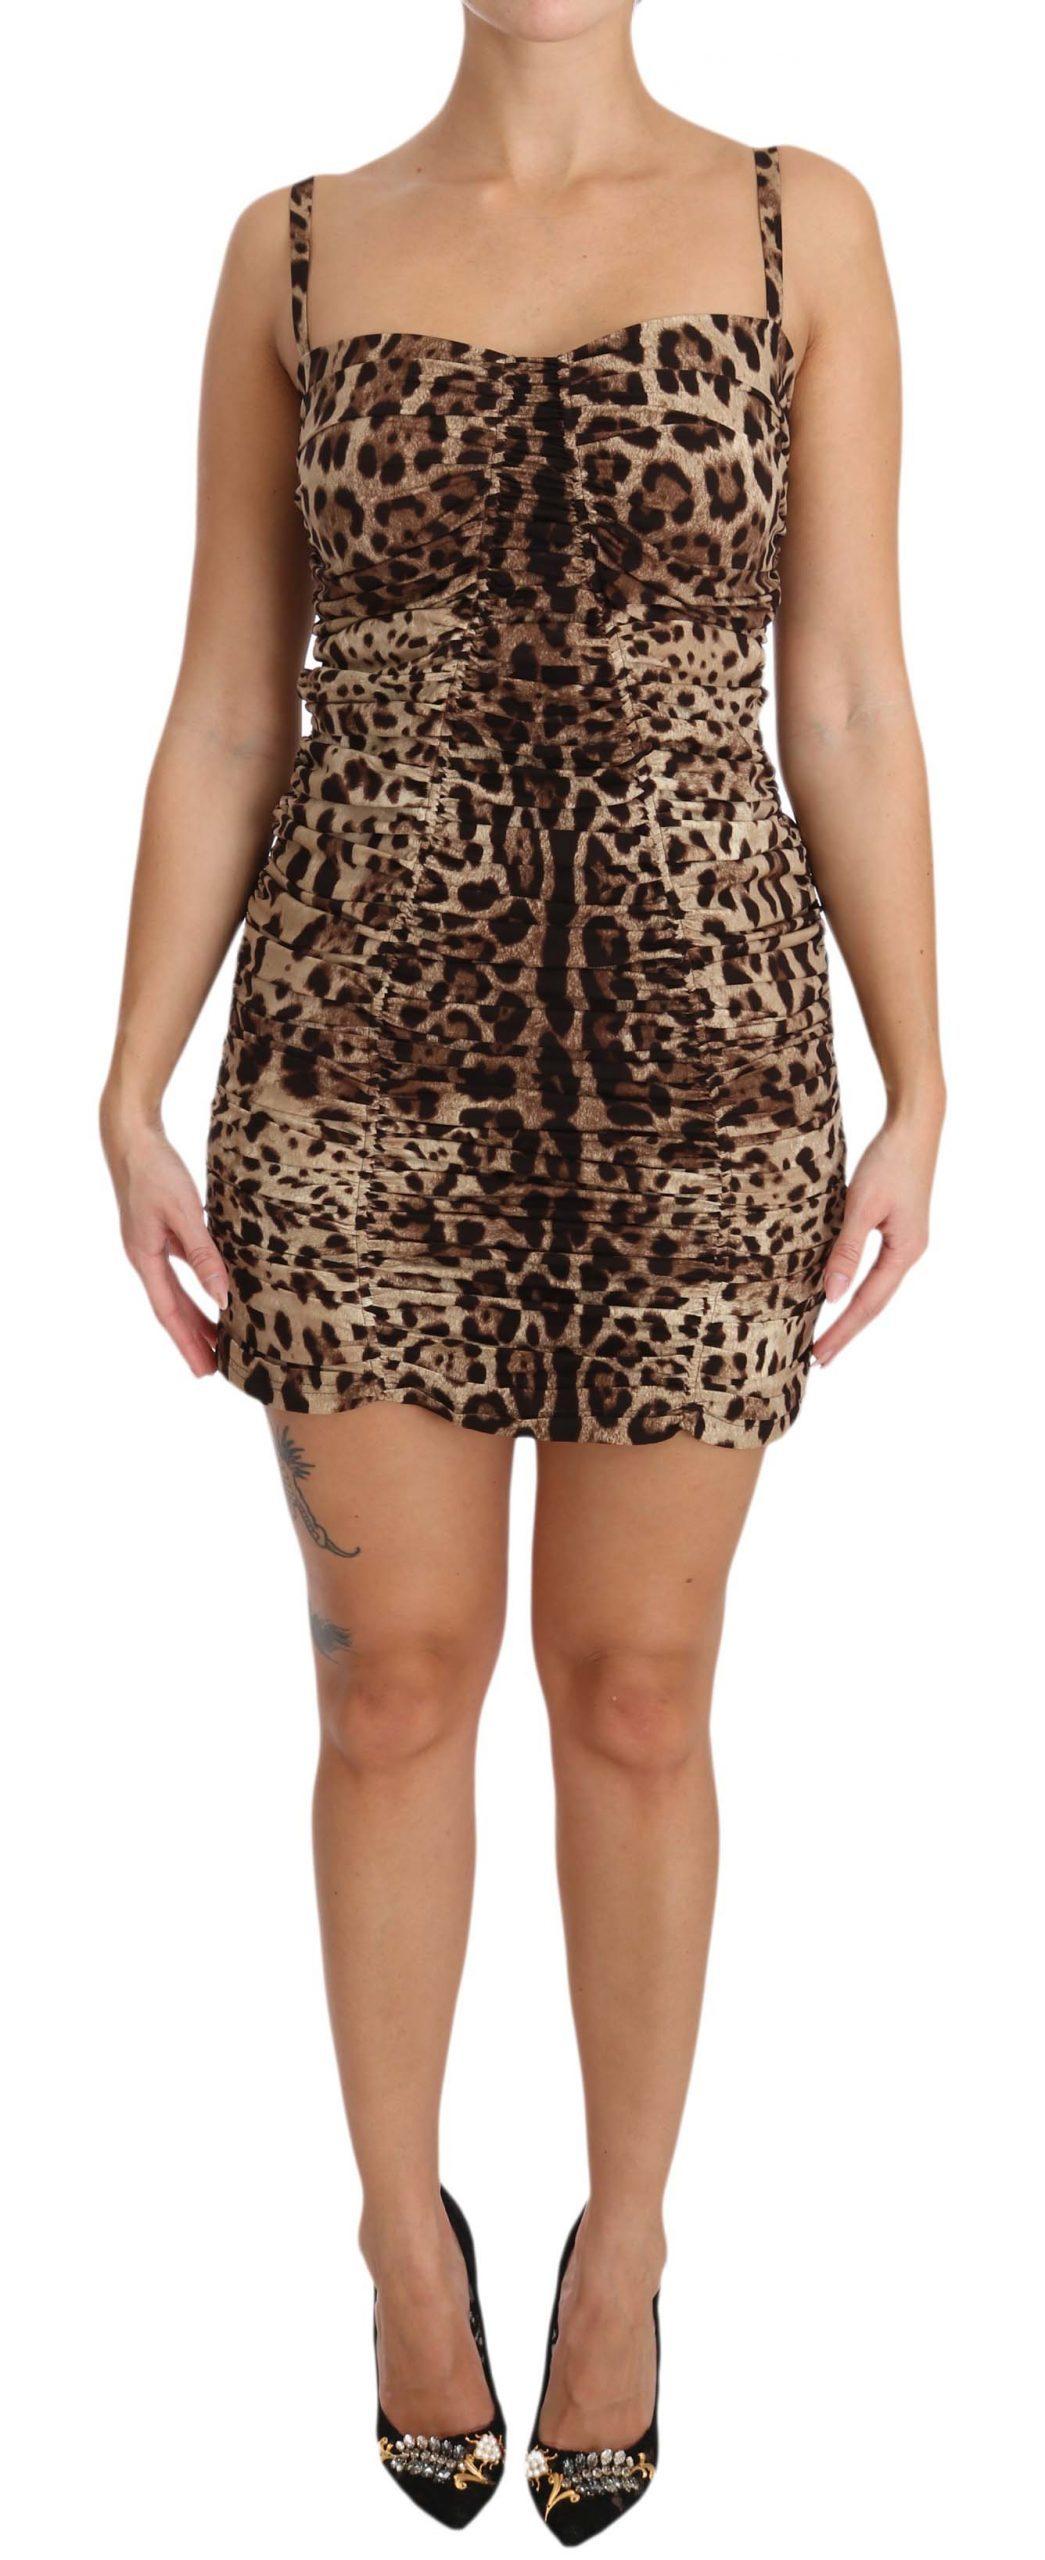 Dolce & Gabbana Women's Leopard Silk Sheath Bodycon Dress Brown DR1610 - IT48 | XL